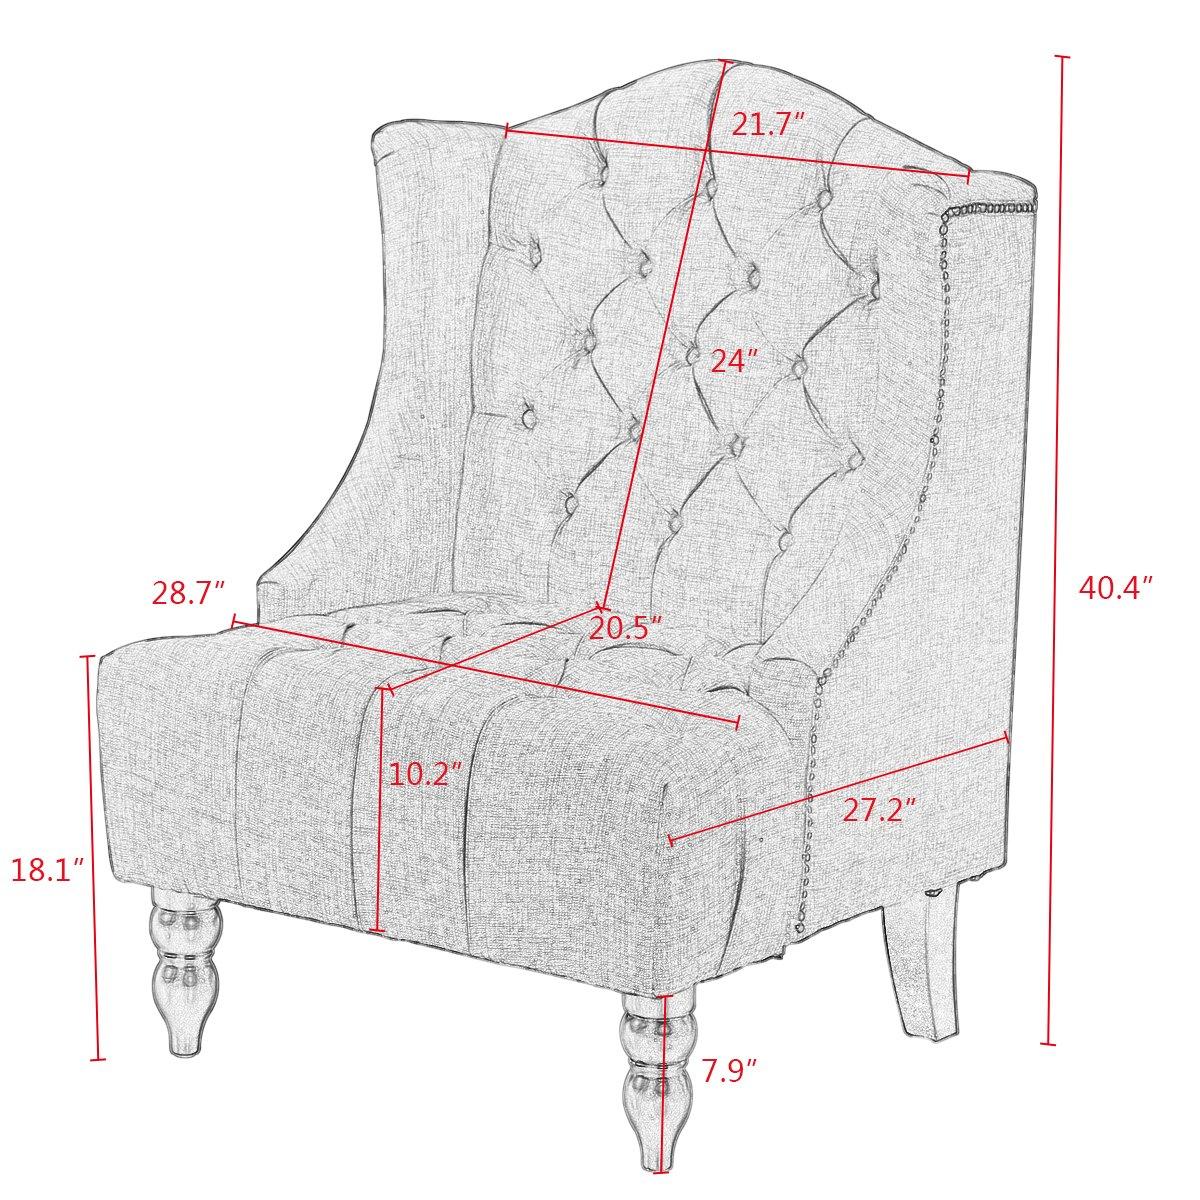 Giantex Sofa Tufted Tall Wingback Vintage Tufted Fabric Accent Chair Home Furniture Nailhead Armchair